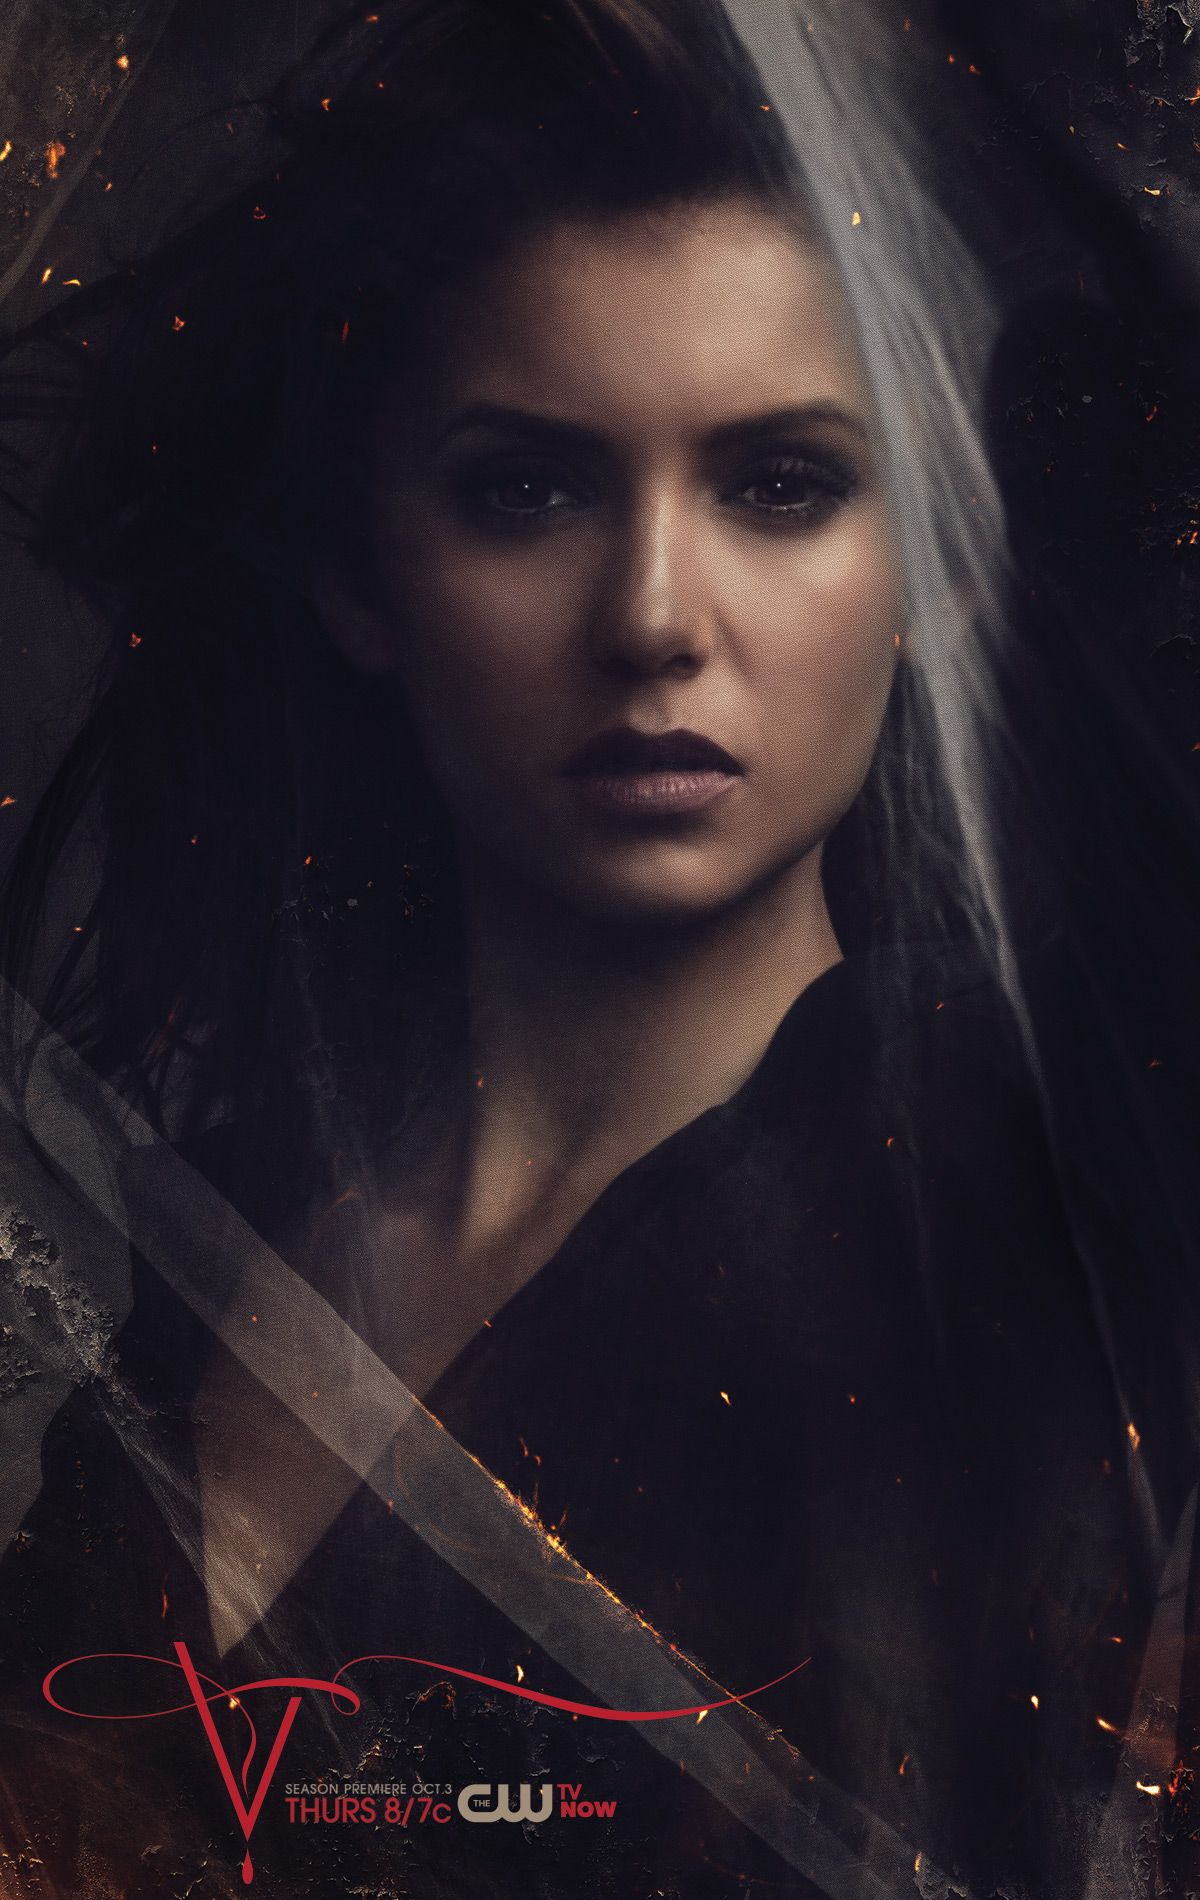 Vampire Diaries Cast Vampire Diaries Season 5 Vampire Diaries Poster Vampire Diaries Wallpaper